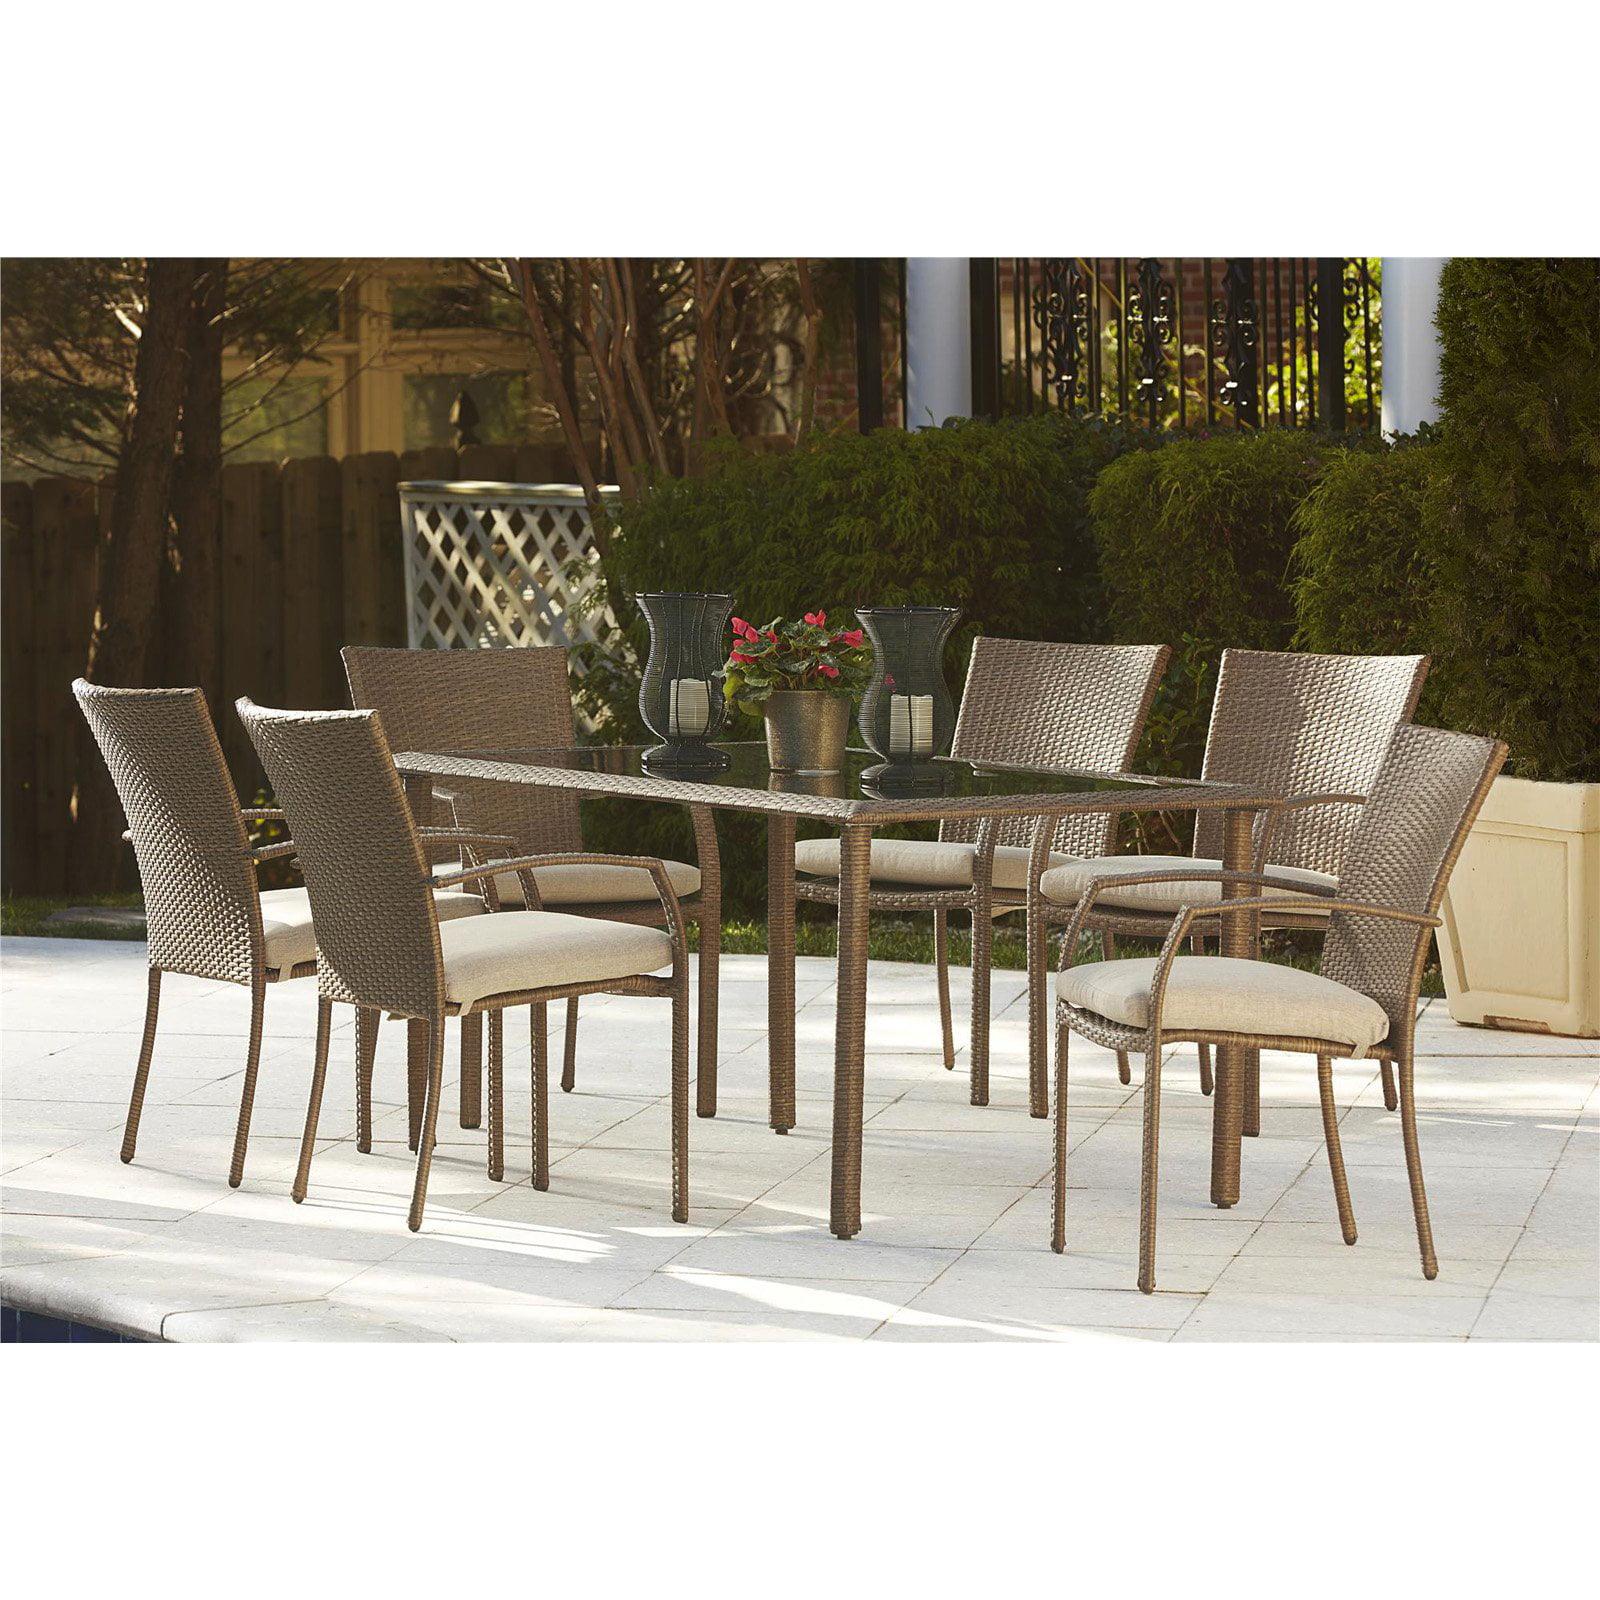 Cosco Outdoor Furniture 7 Piece Lakewood Ranch Steel Woven Wicker